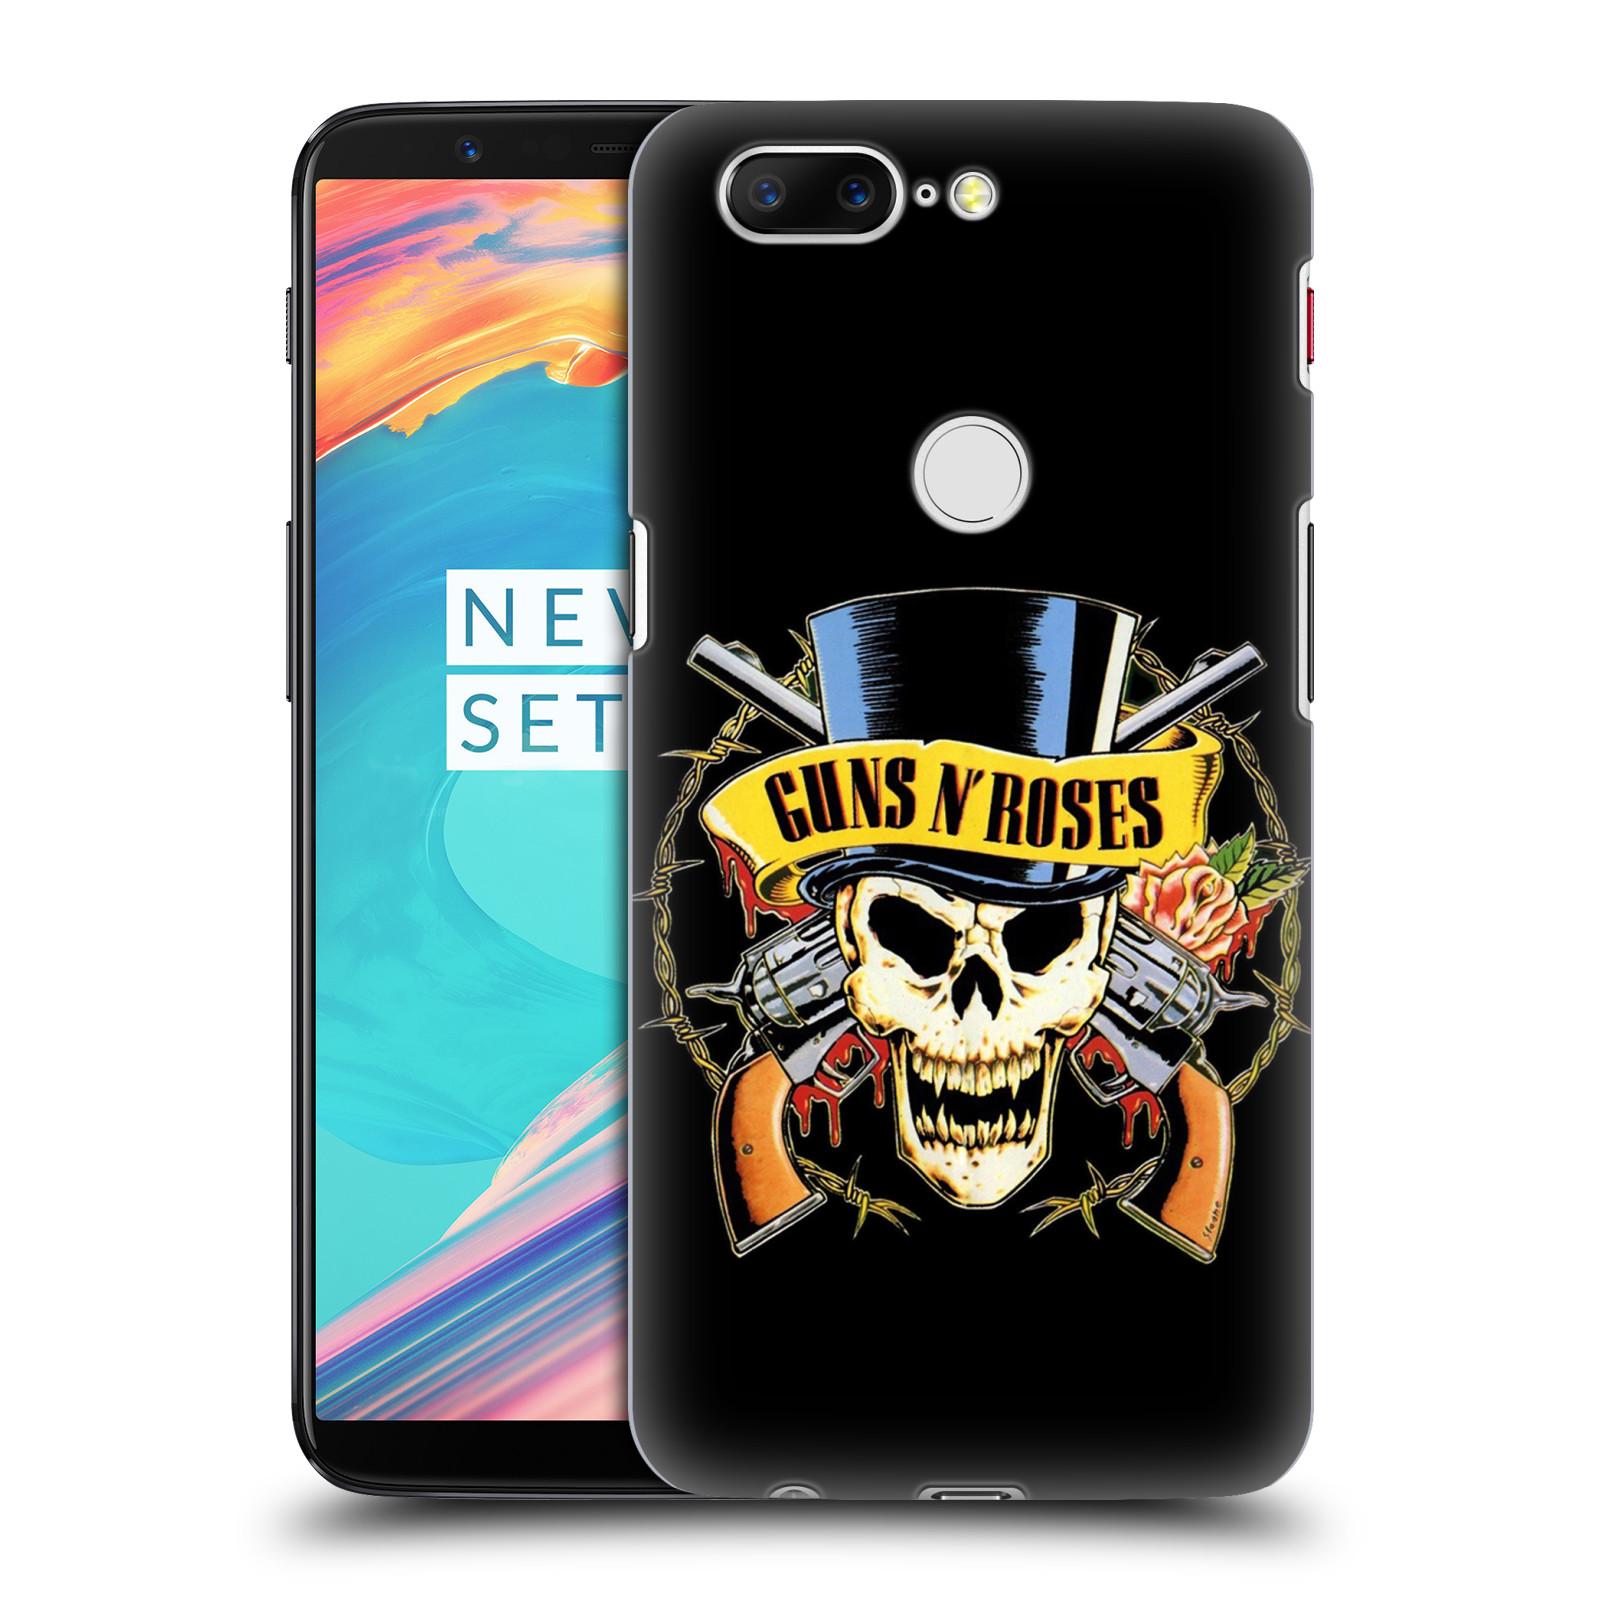 Plastové pouzdro na mobil OnePlus 5T - Head Case - Guns N' Roses - Lebka